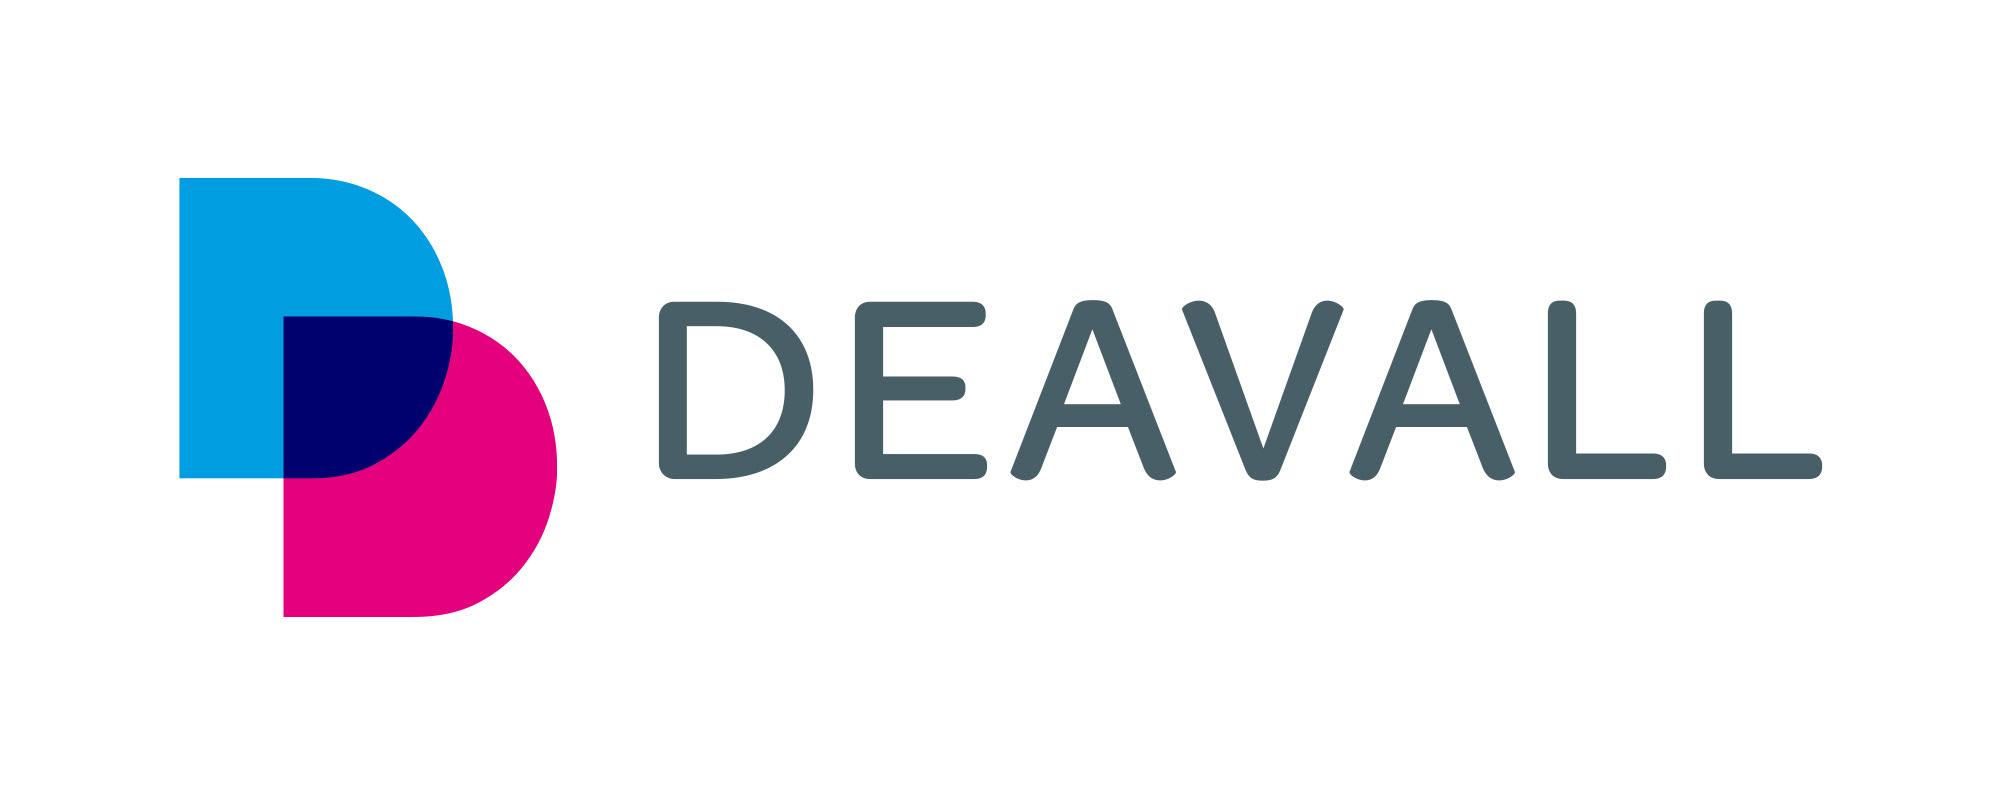 Deavall Design